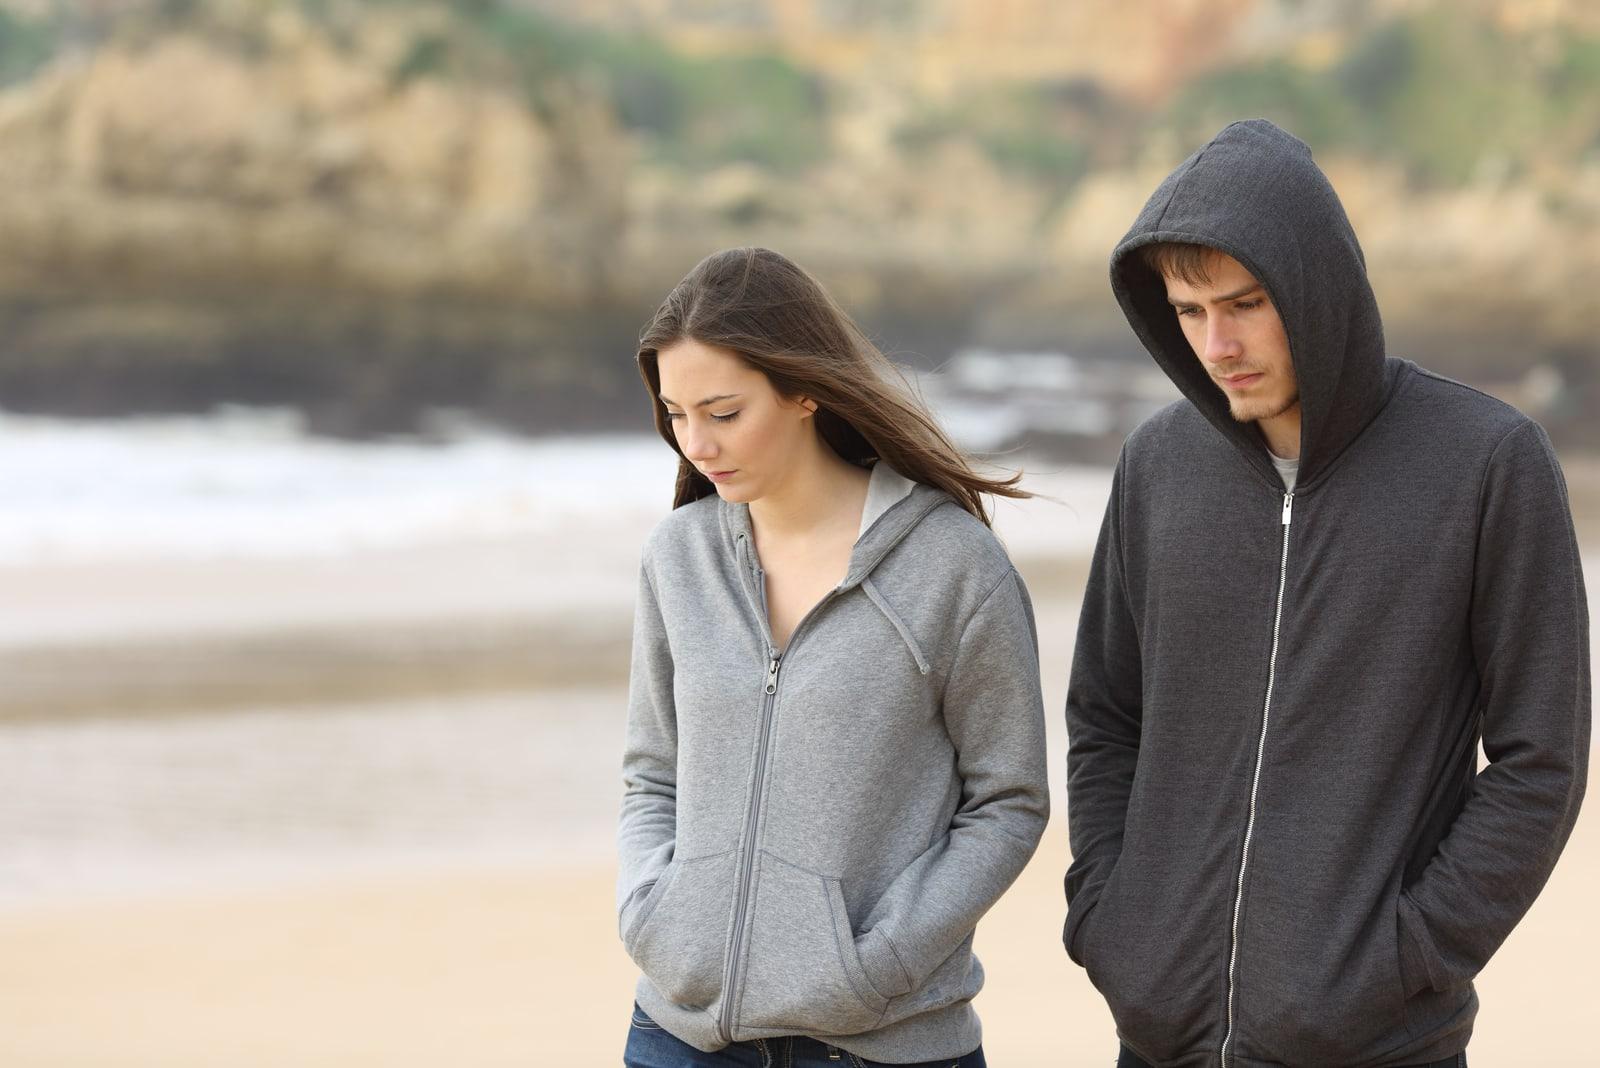 upset couple walking outdoor